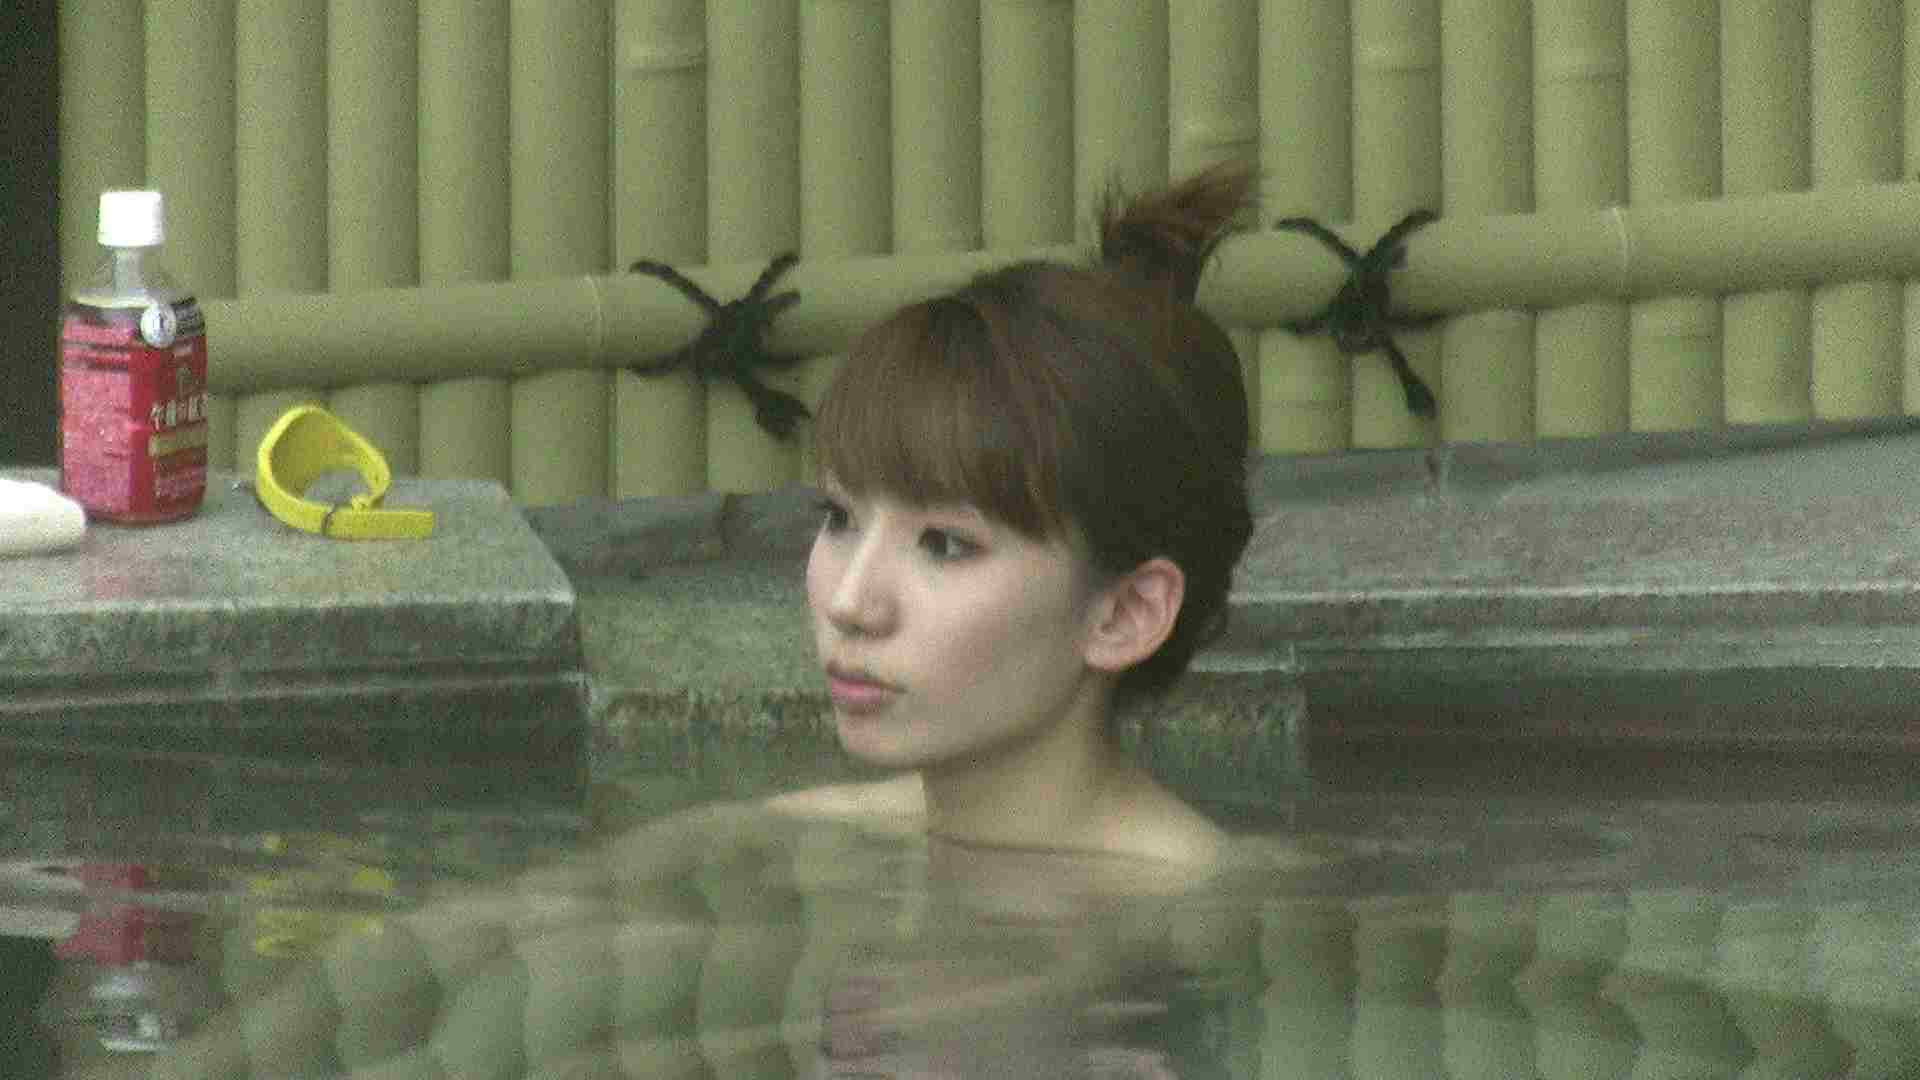 Aquaな露天風呂Vol.208 HなOL   盗撮  101pic 34